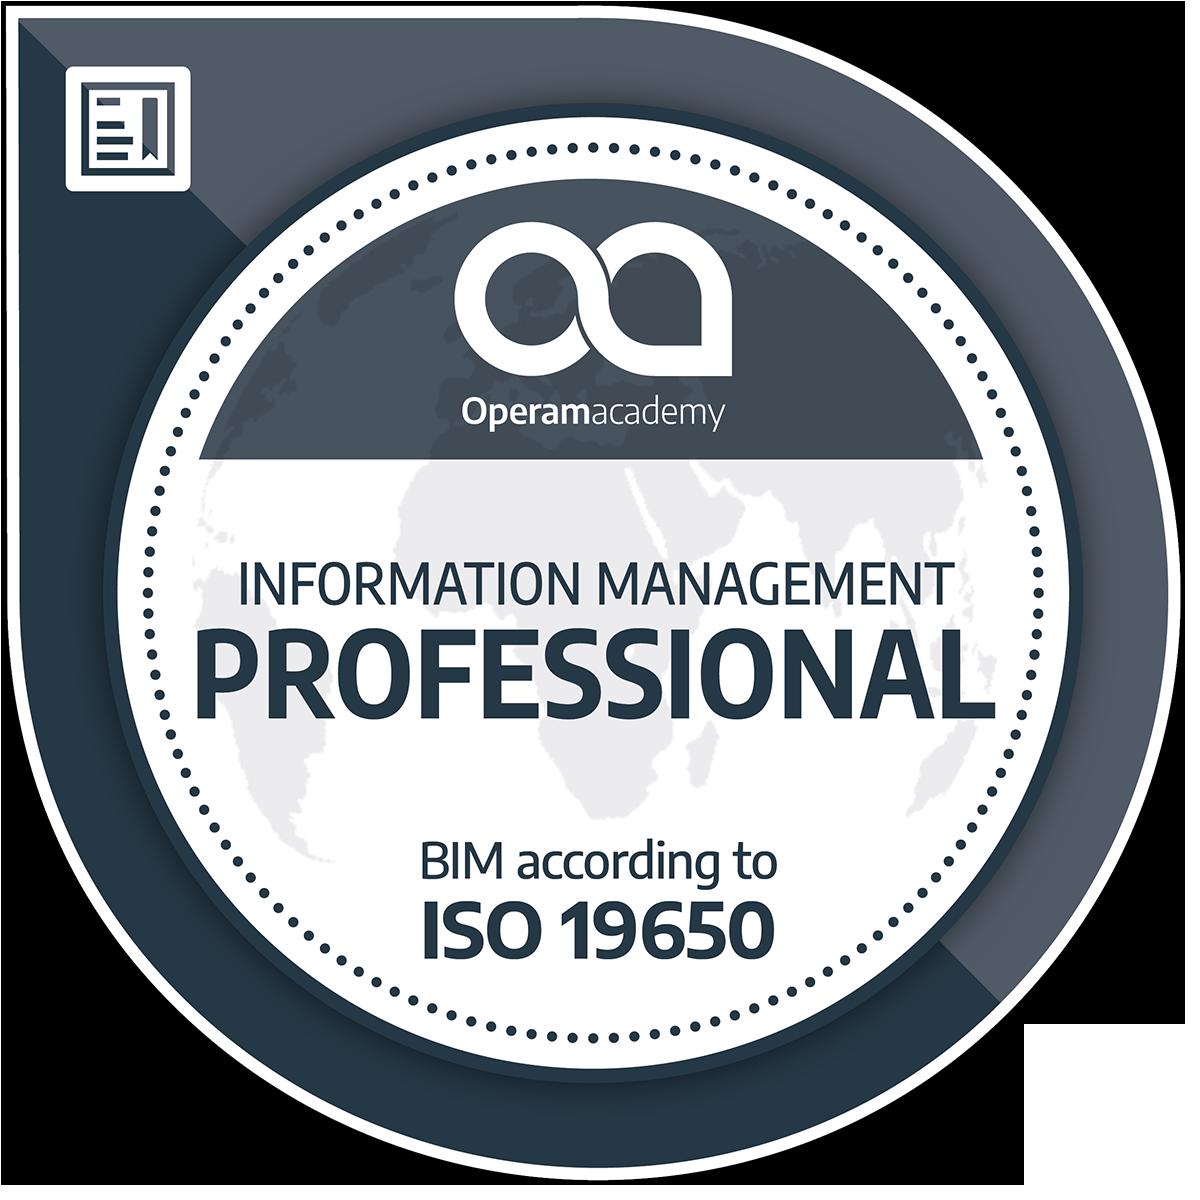 Information Management Professional